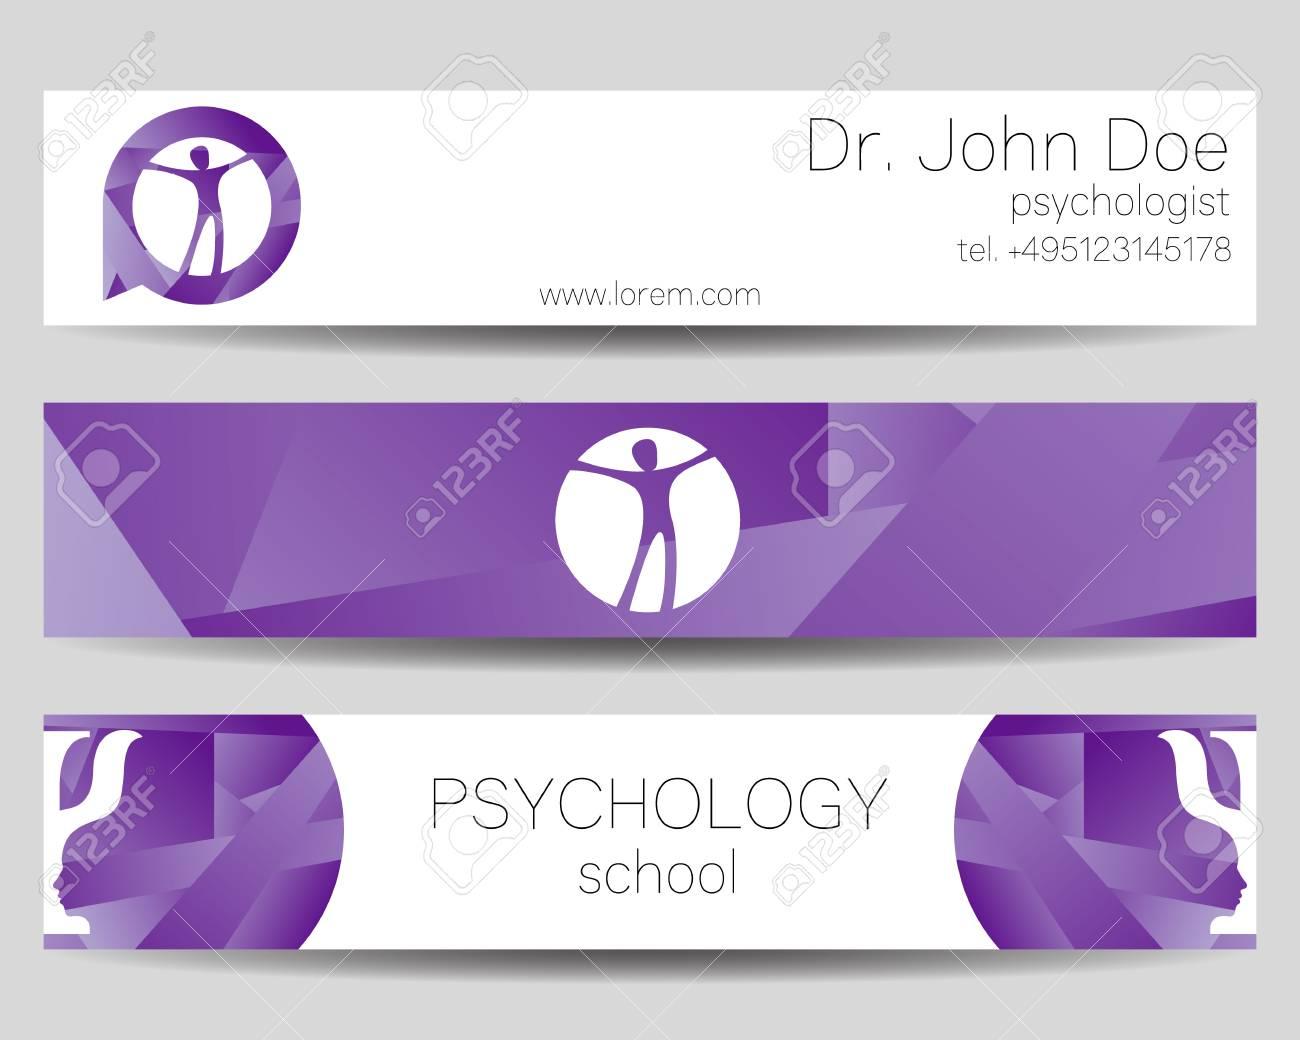 a vector psychology web banner design background or header templates